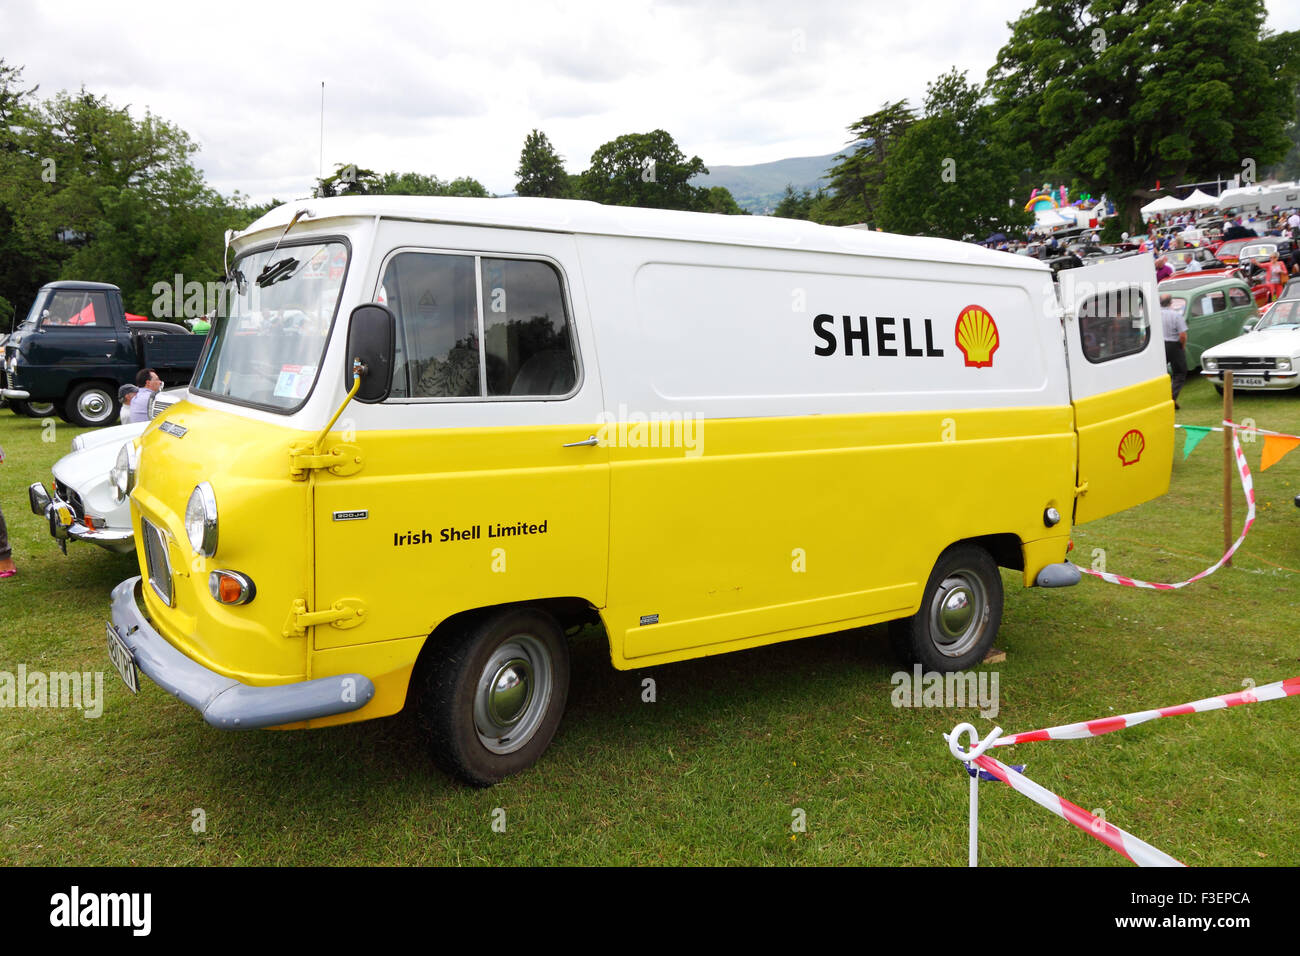 ea9ef80d876fbc Austin Morris Commercial J4 van in retro Shell livery at Kilbroney classic  car show